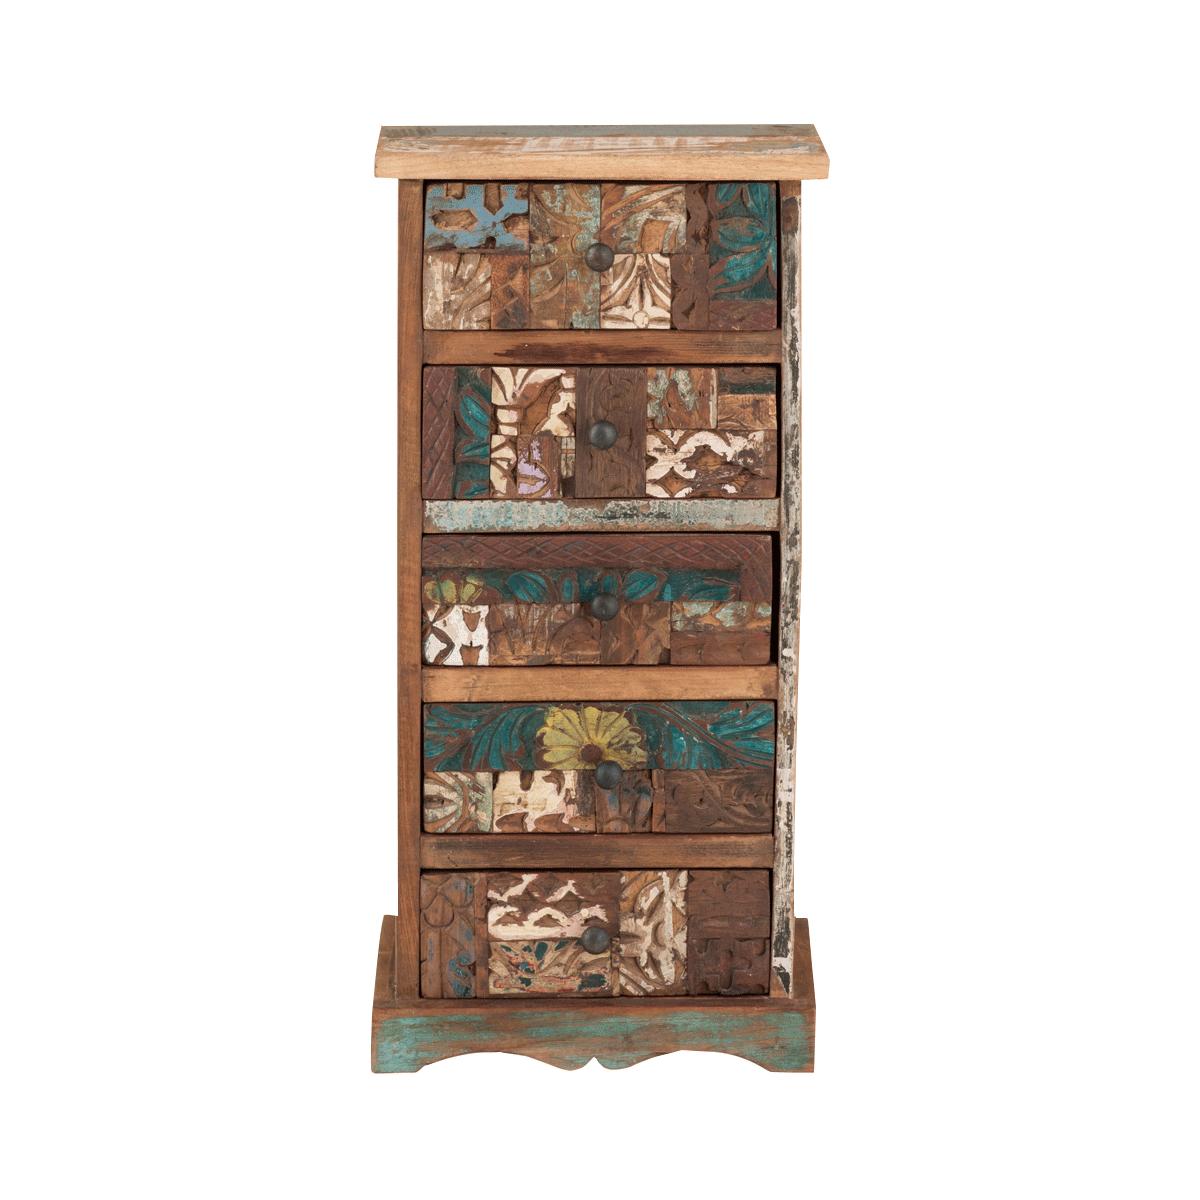 Kommode Reclaim no.4 mit Schubladen aus recyceltem Holz im Retro-Look